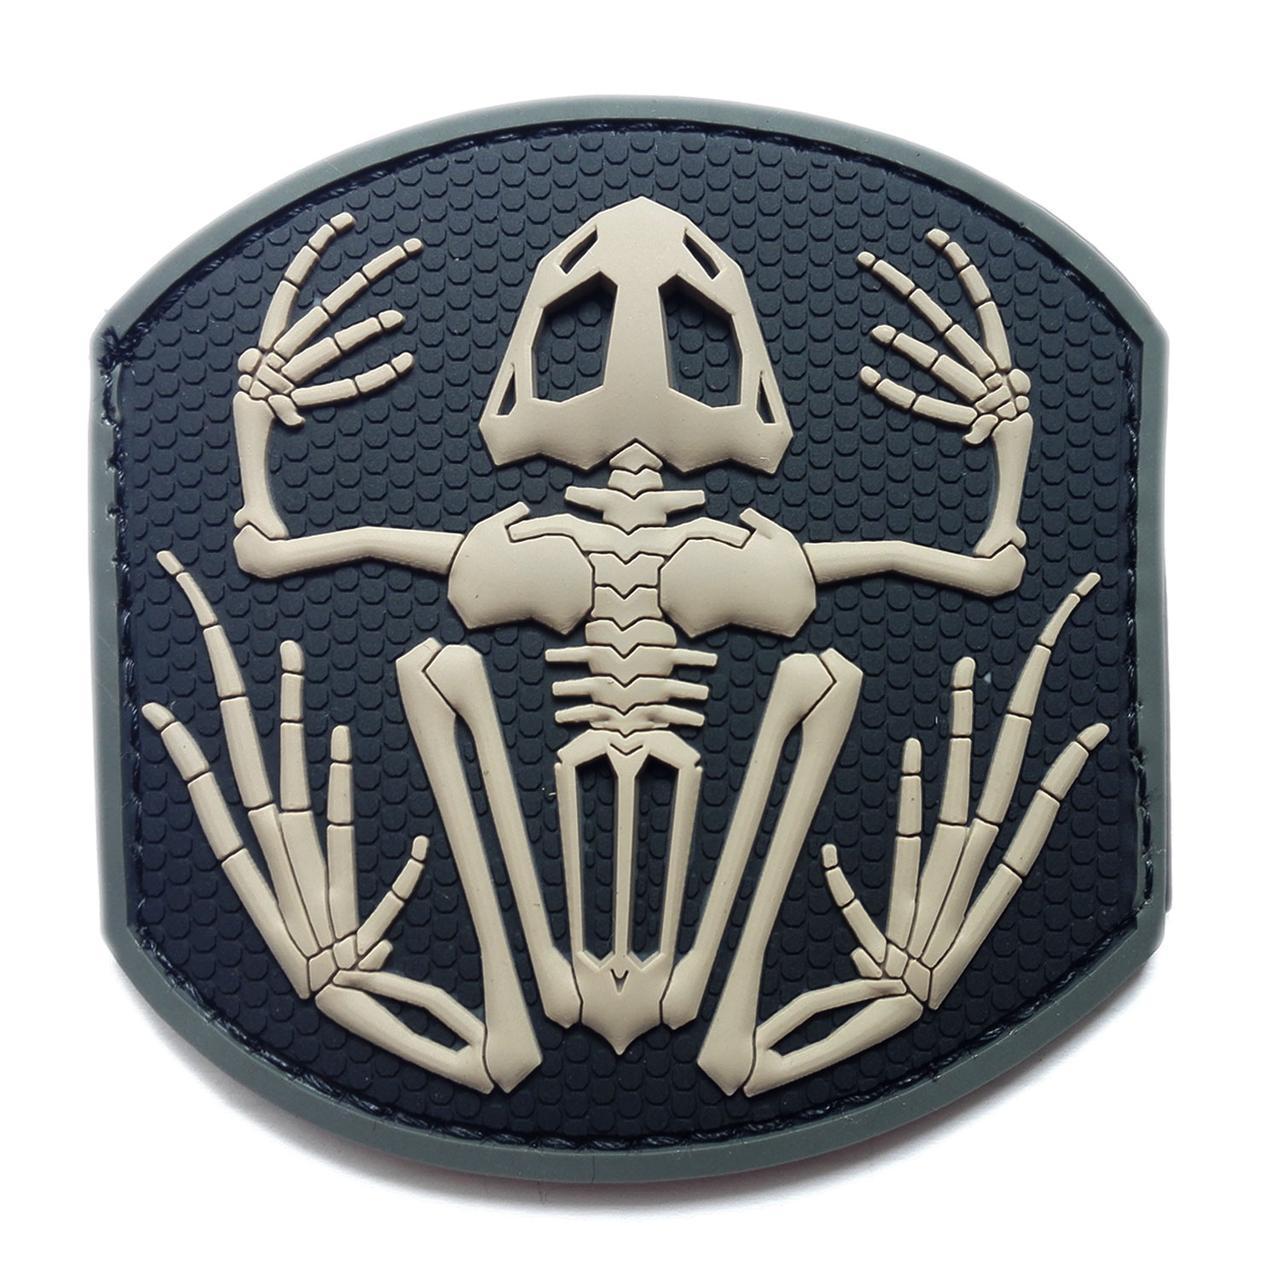 Патч. Frog Skeleton PVC (черный). шеврон. morale patches